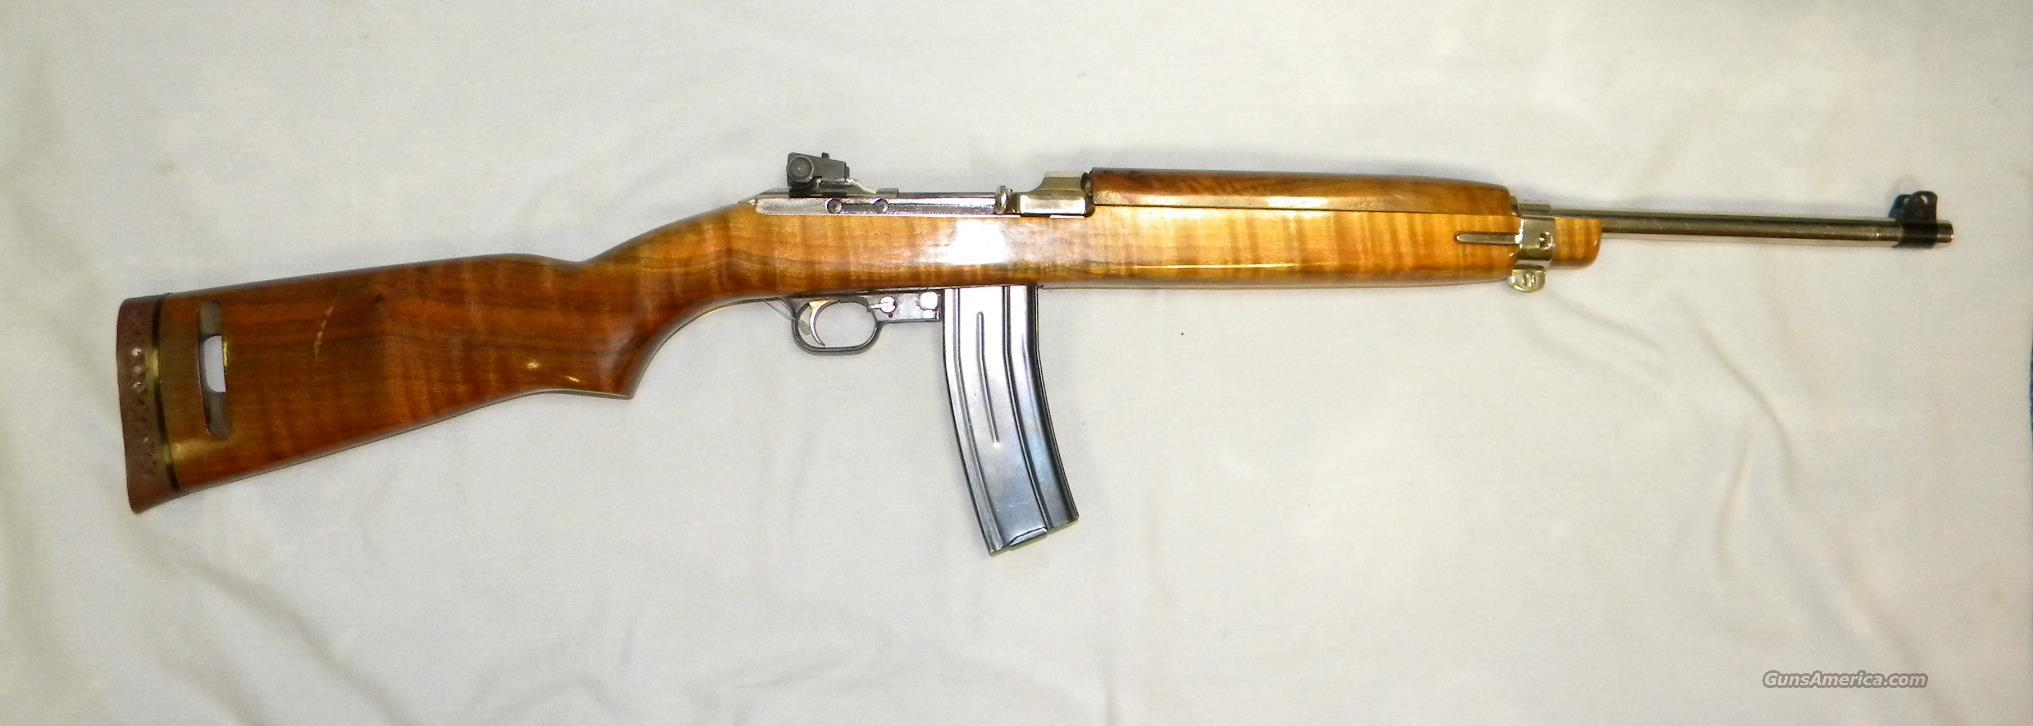 universal m1 carbine nickel for sale